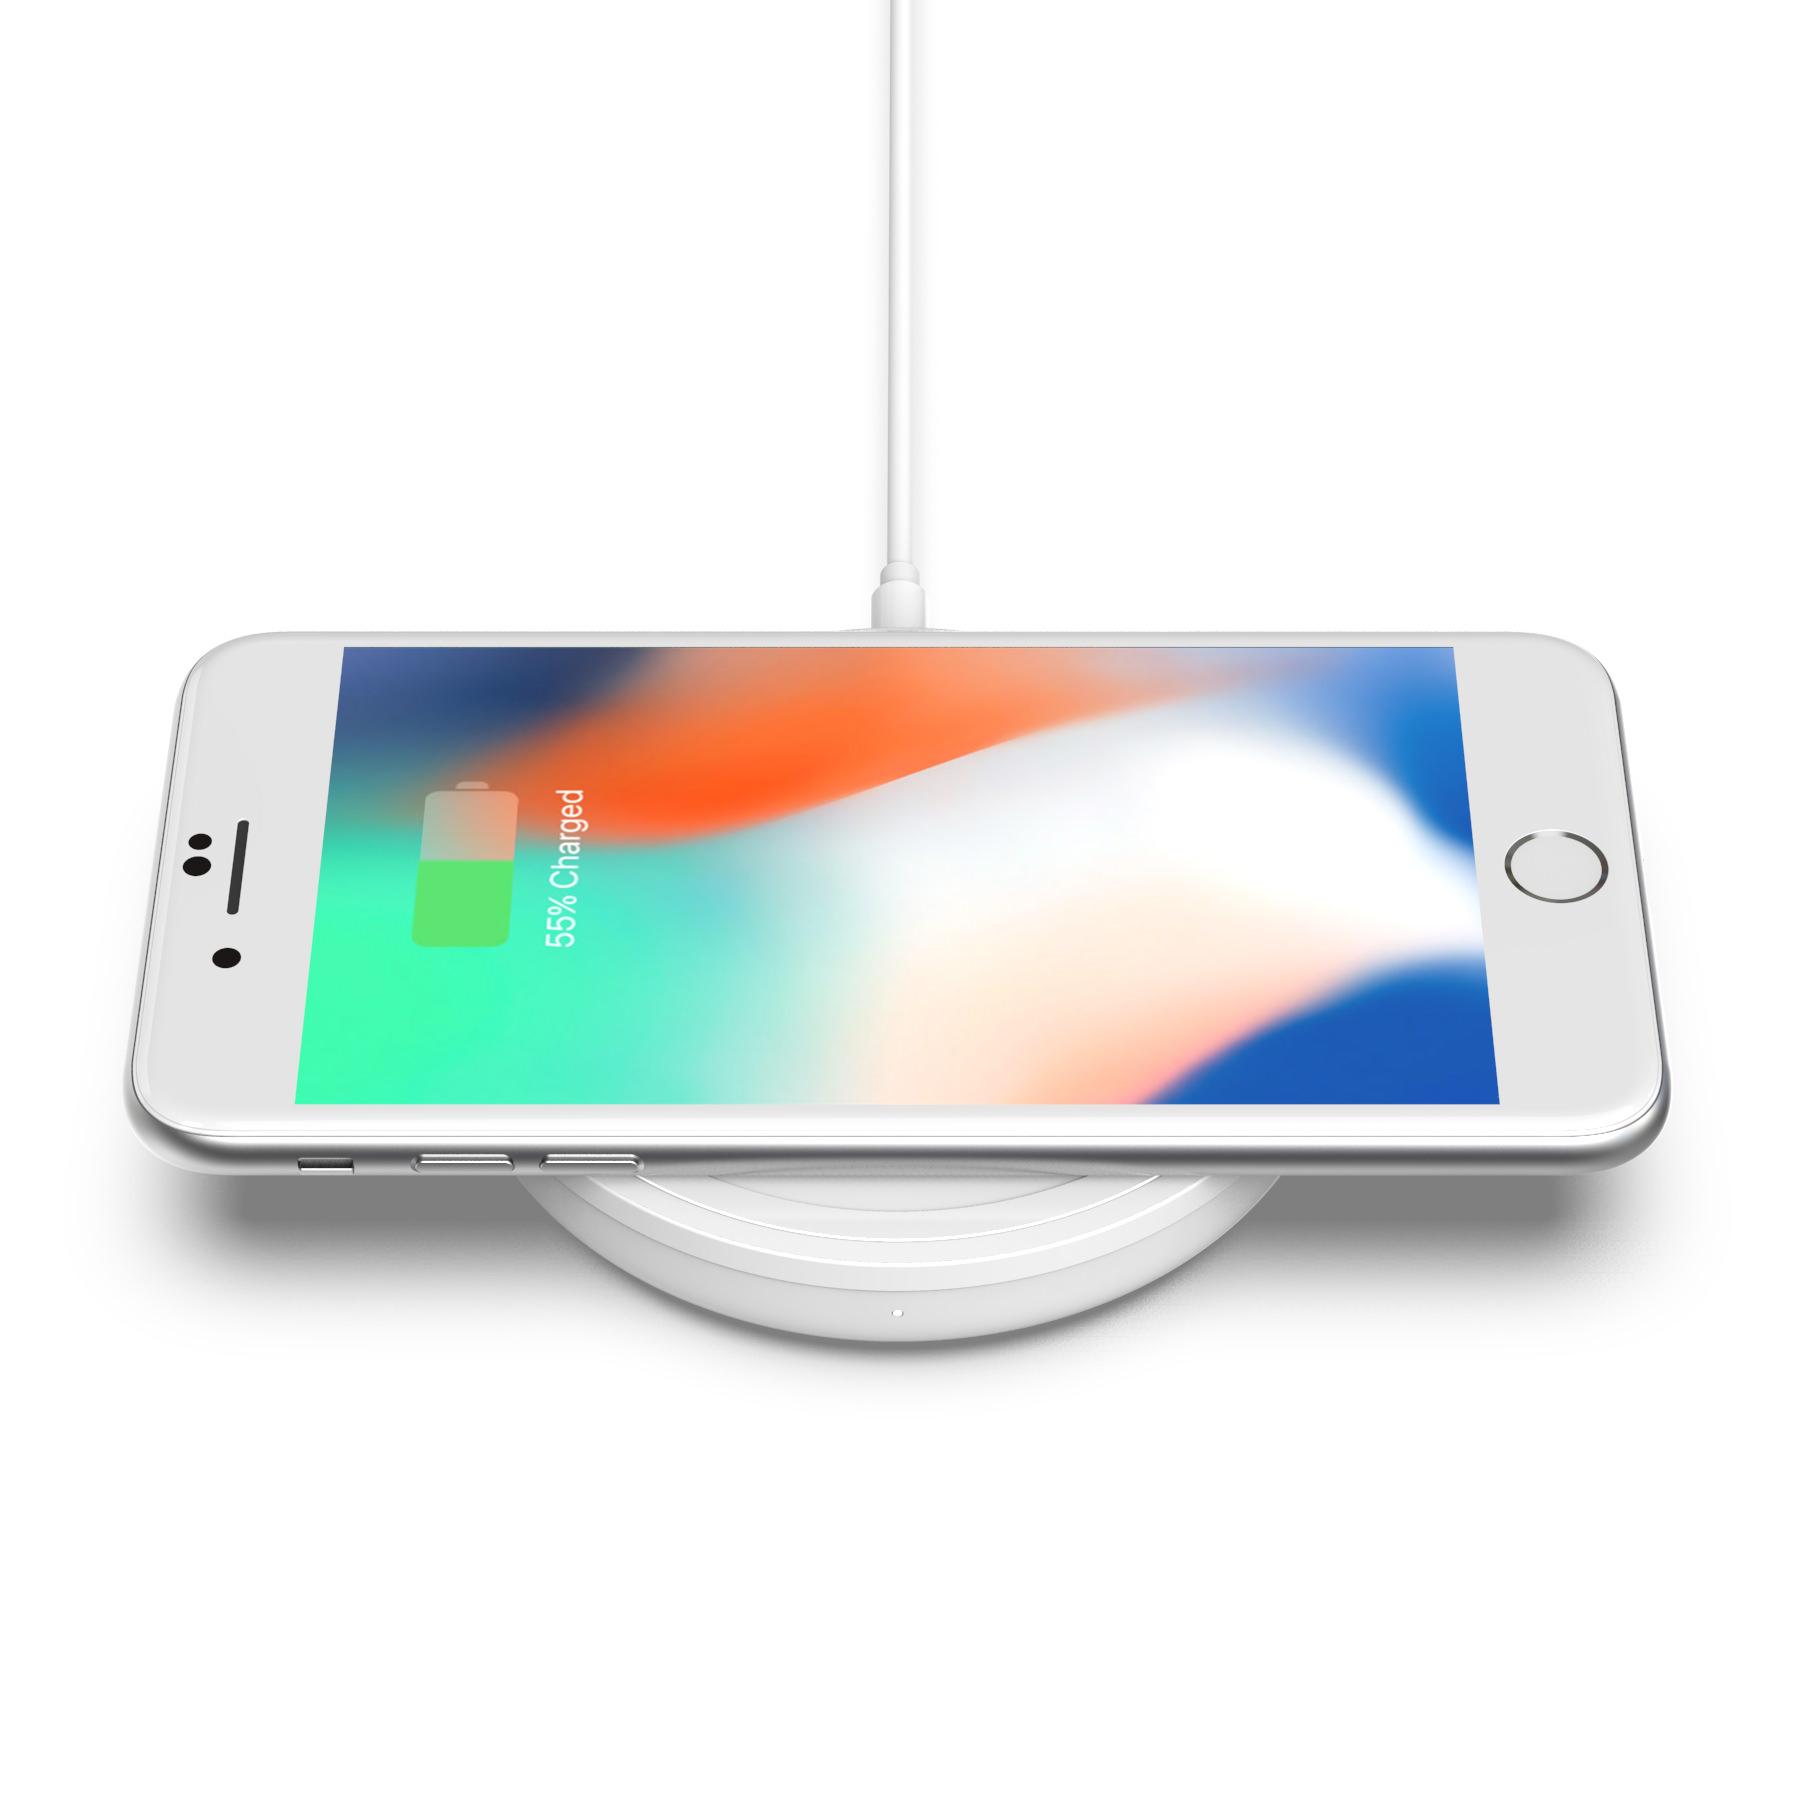 Bold_Charging_Pad_iPhone_4.jpg